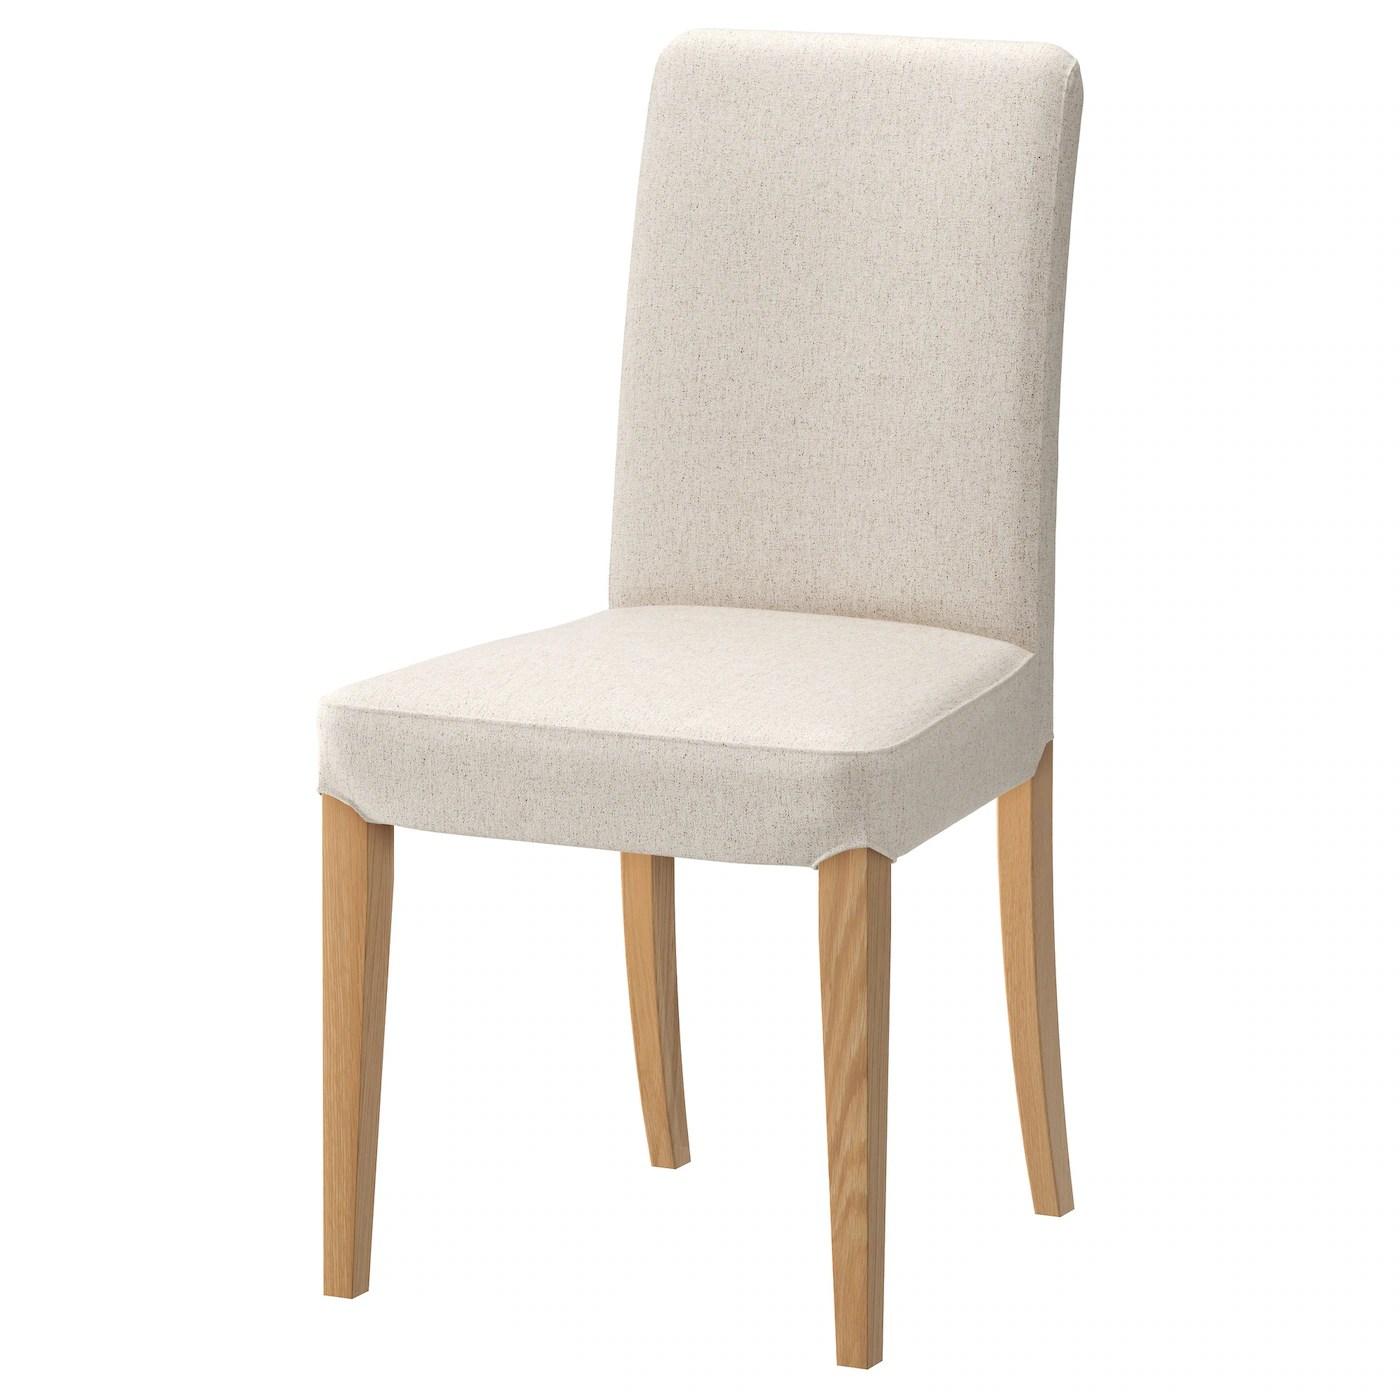 ikea high chairs lazy boy recliner chair covers australia henriksdal oak linneryd natural